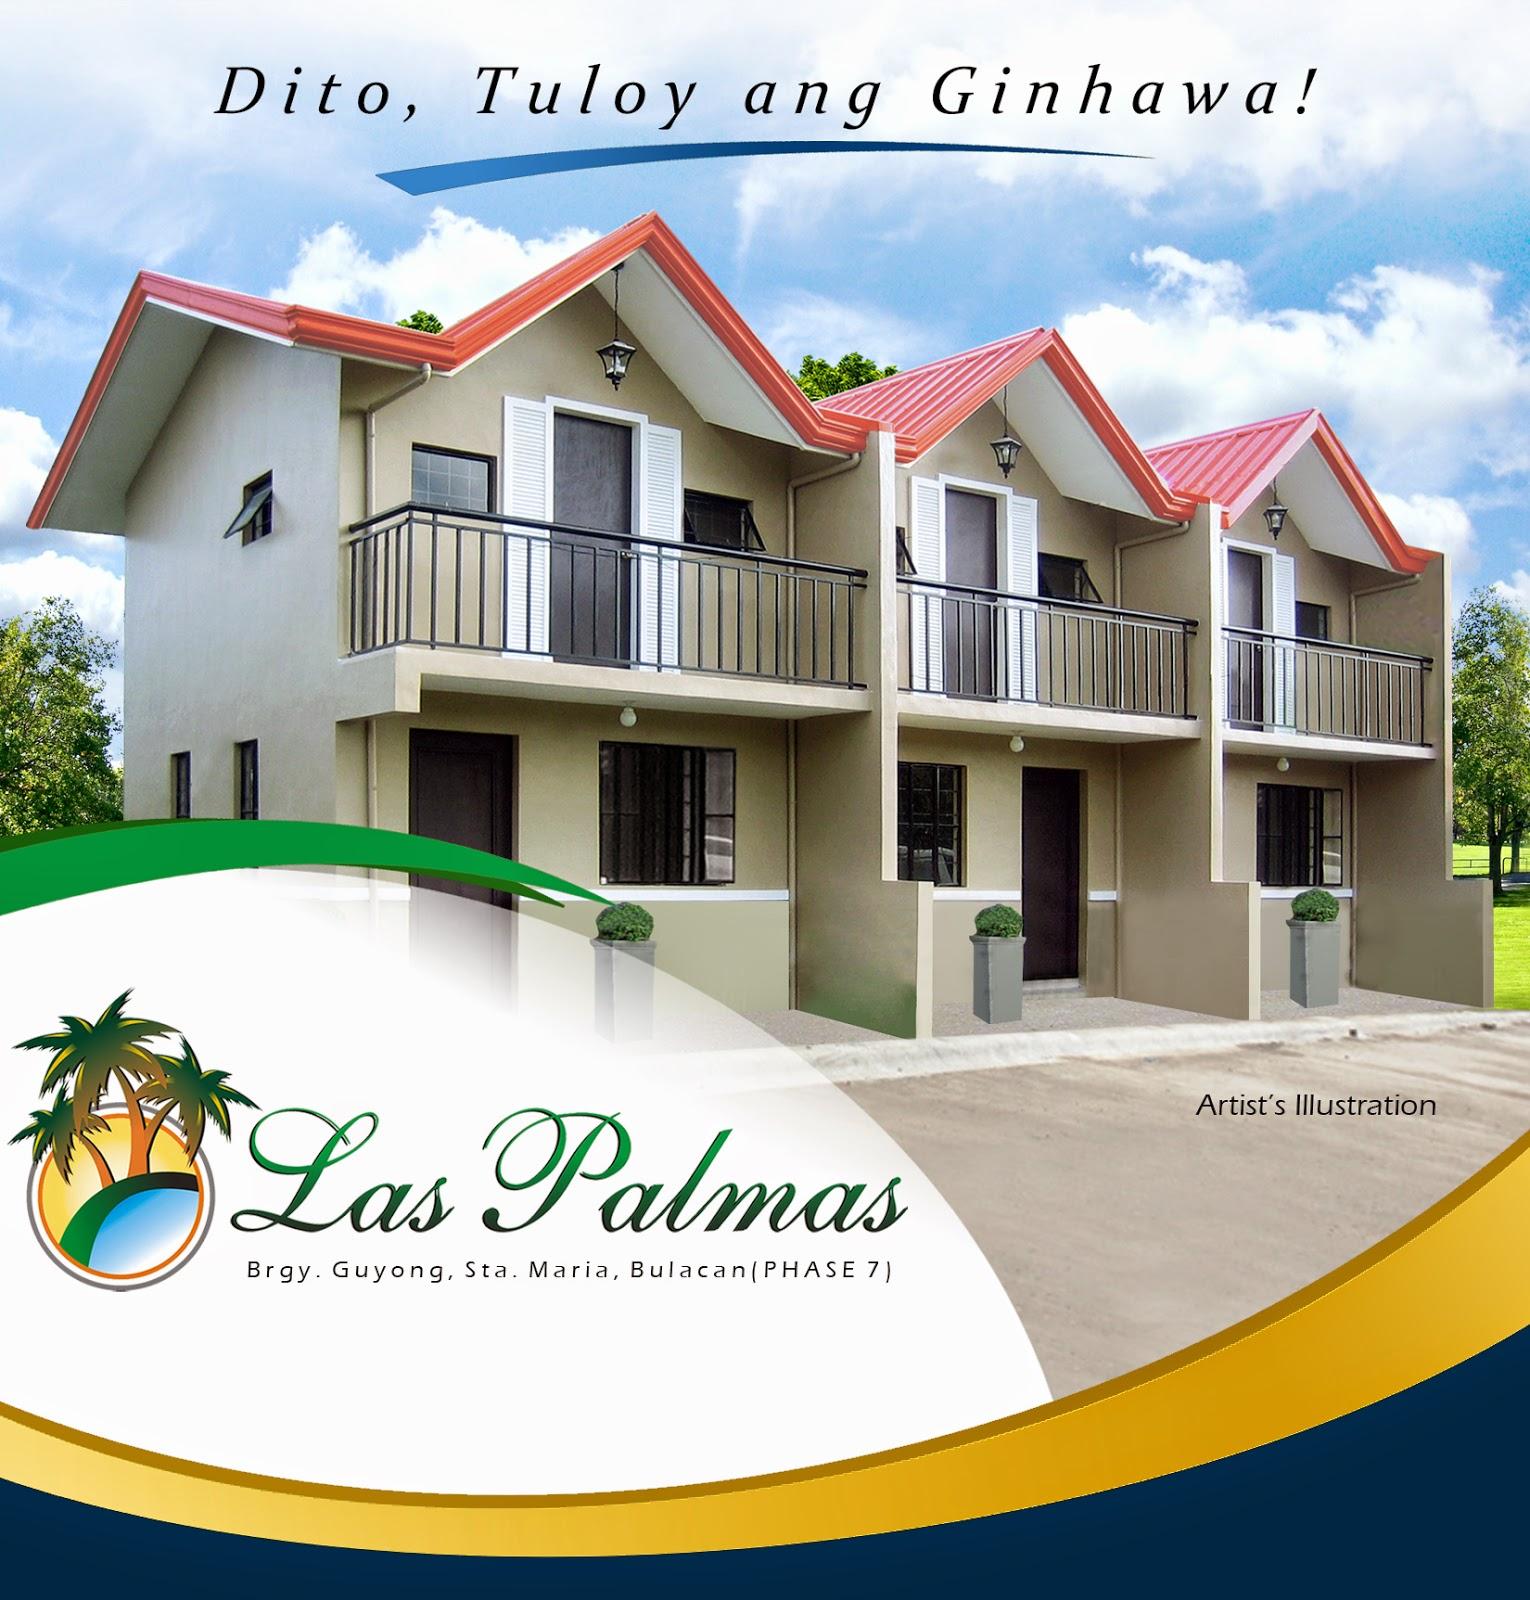 Las palmas subdivision sta maria bulacan las palmas for Subdivision house plans